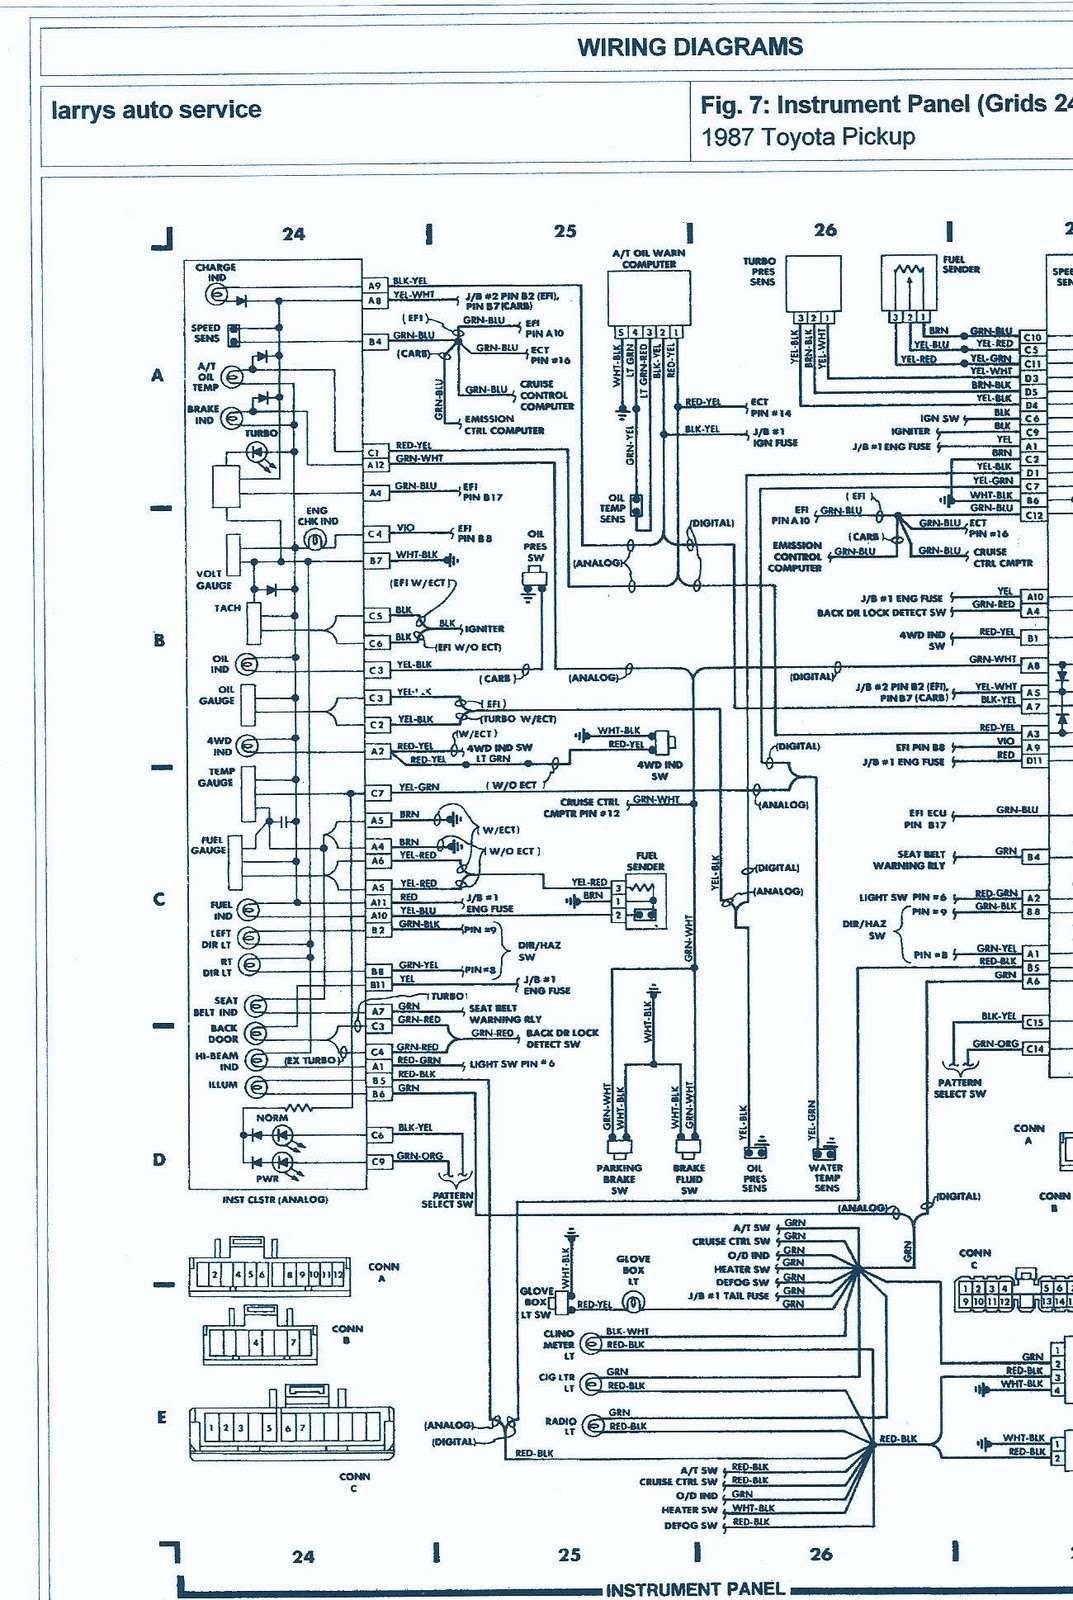 4400 international truck wiring diagrams | schematic and wiring diagram in  2020 | electrical wiring diagram, toyota, electrical diagram  pinterest